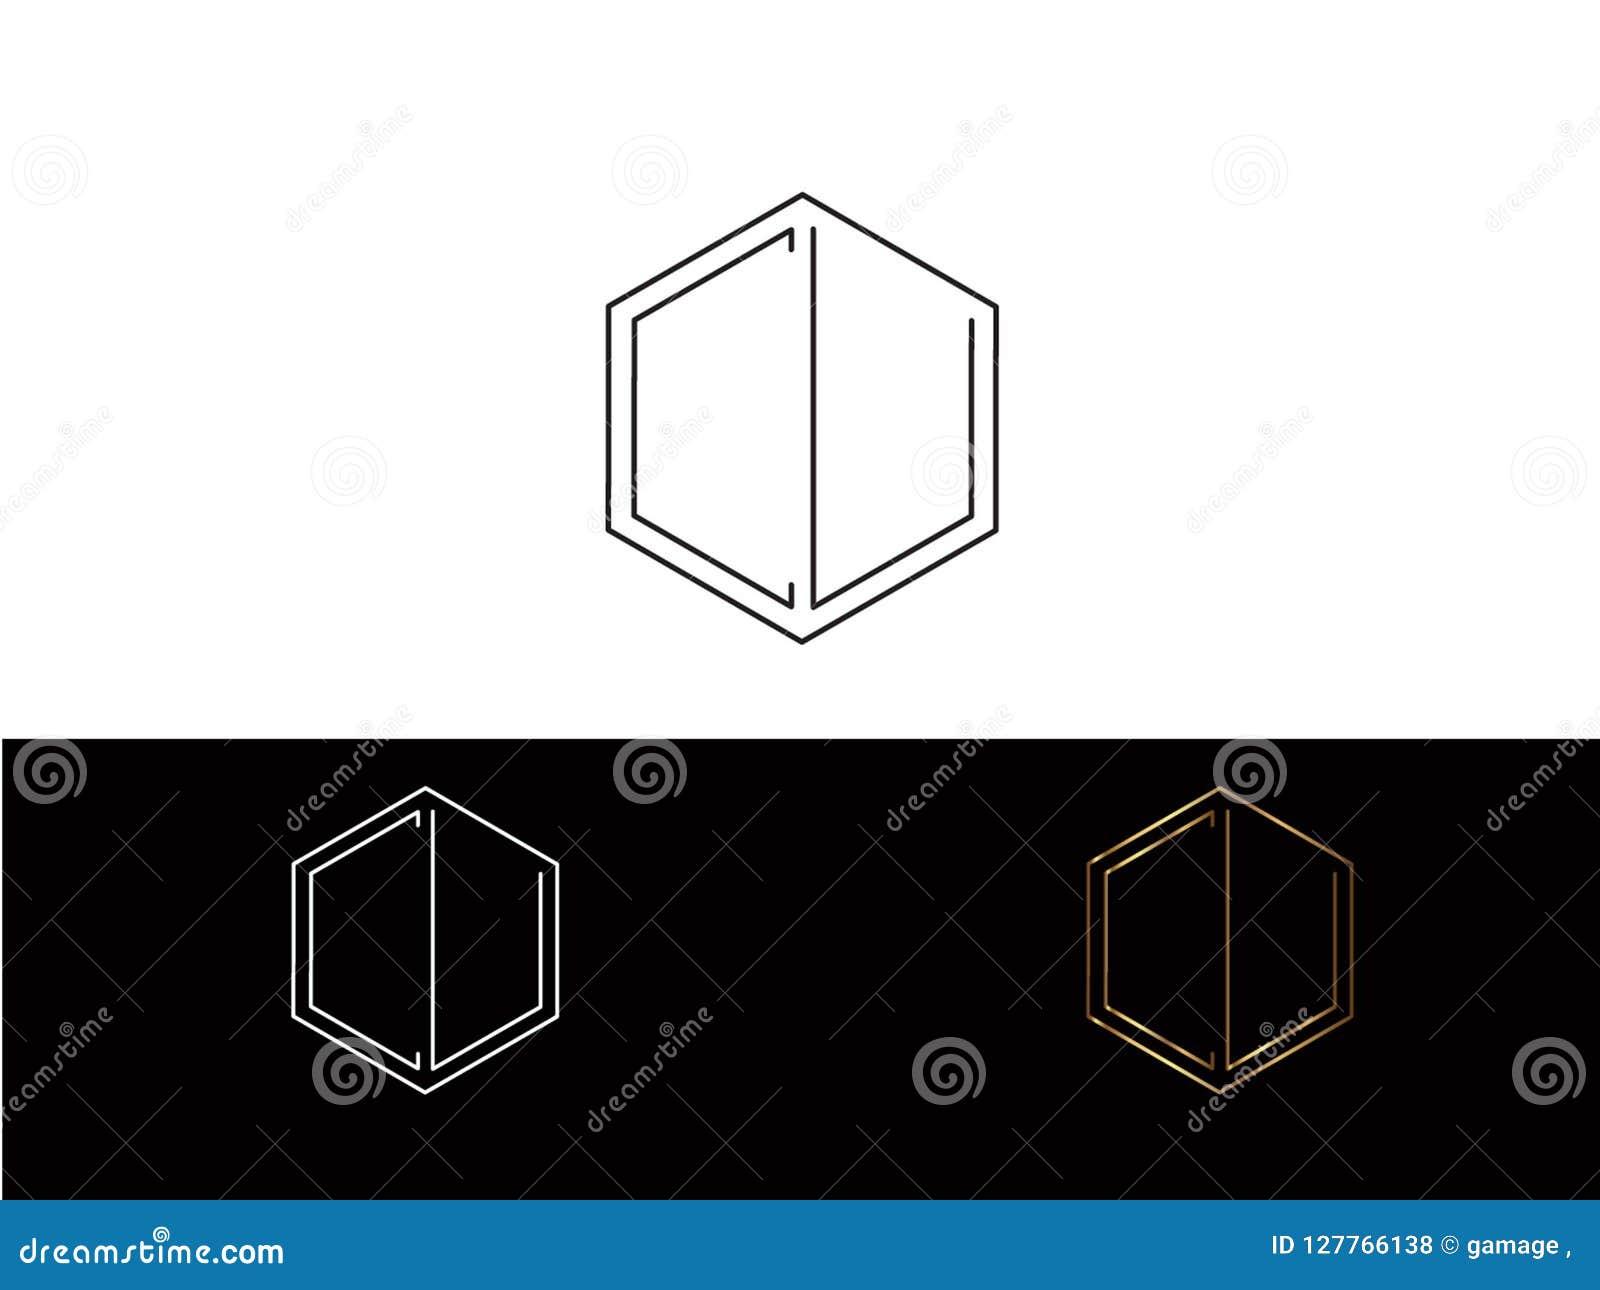 CU-Hexagonformbuchstabe-Vektordesign